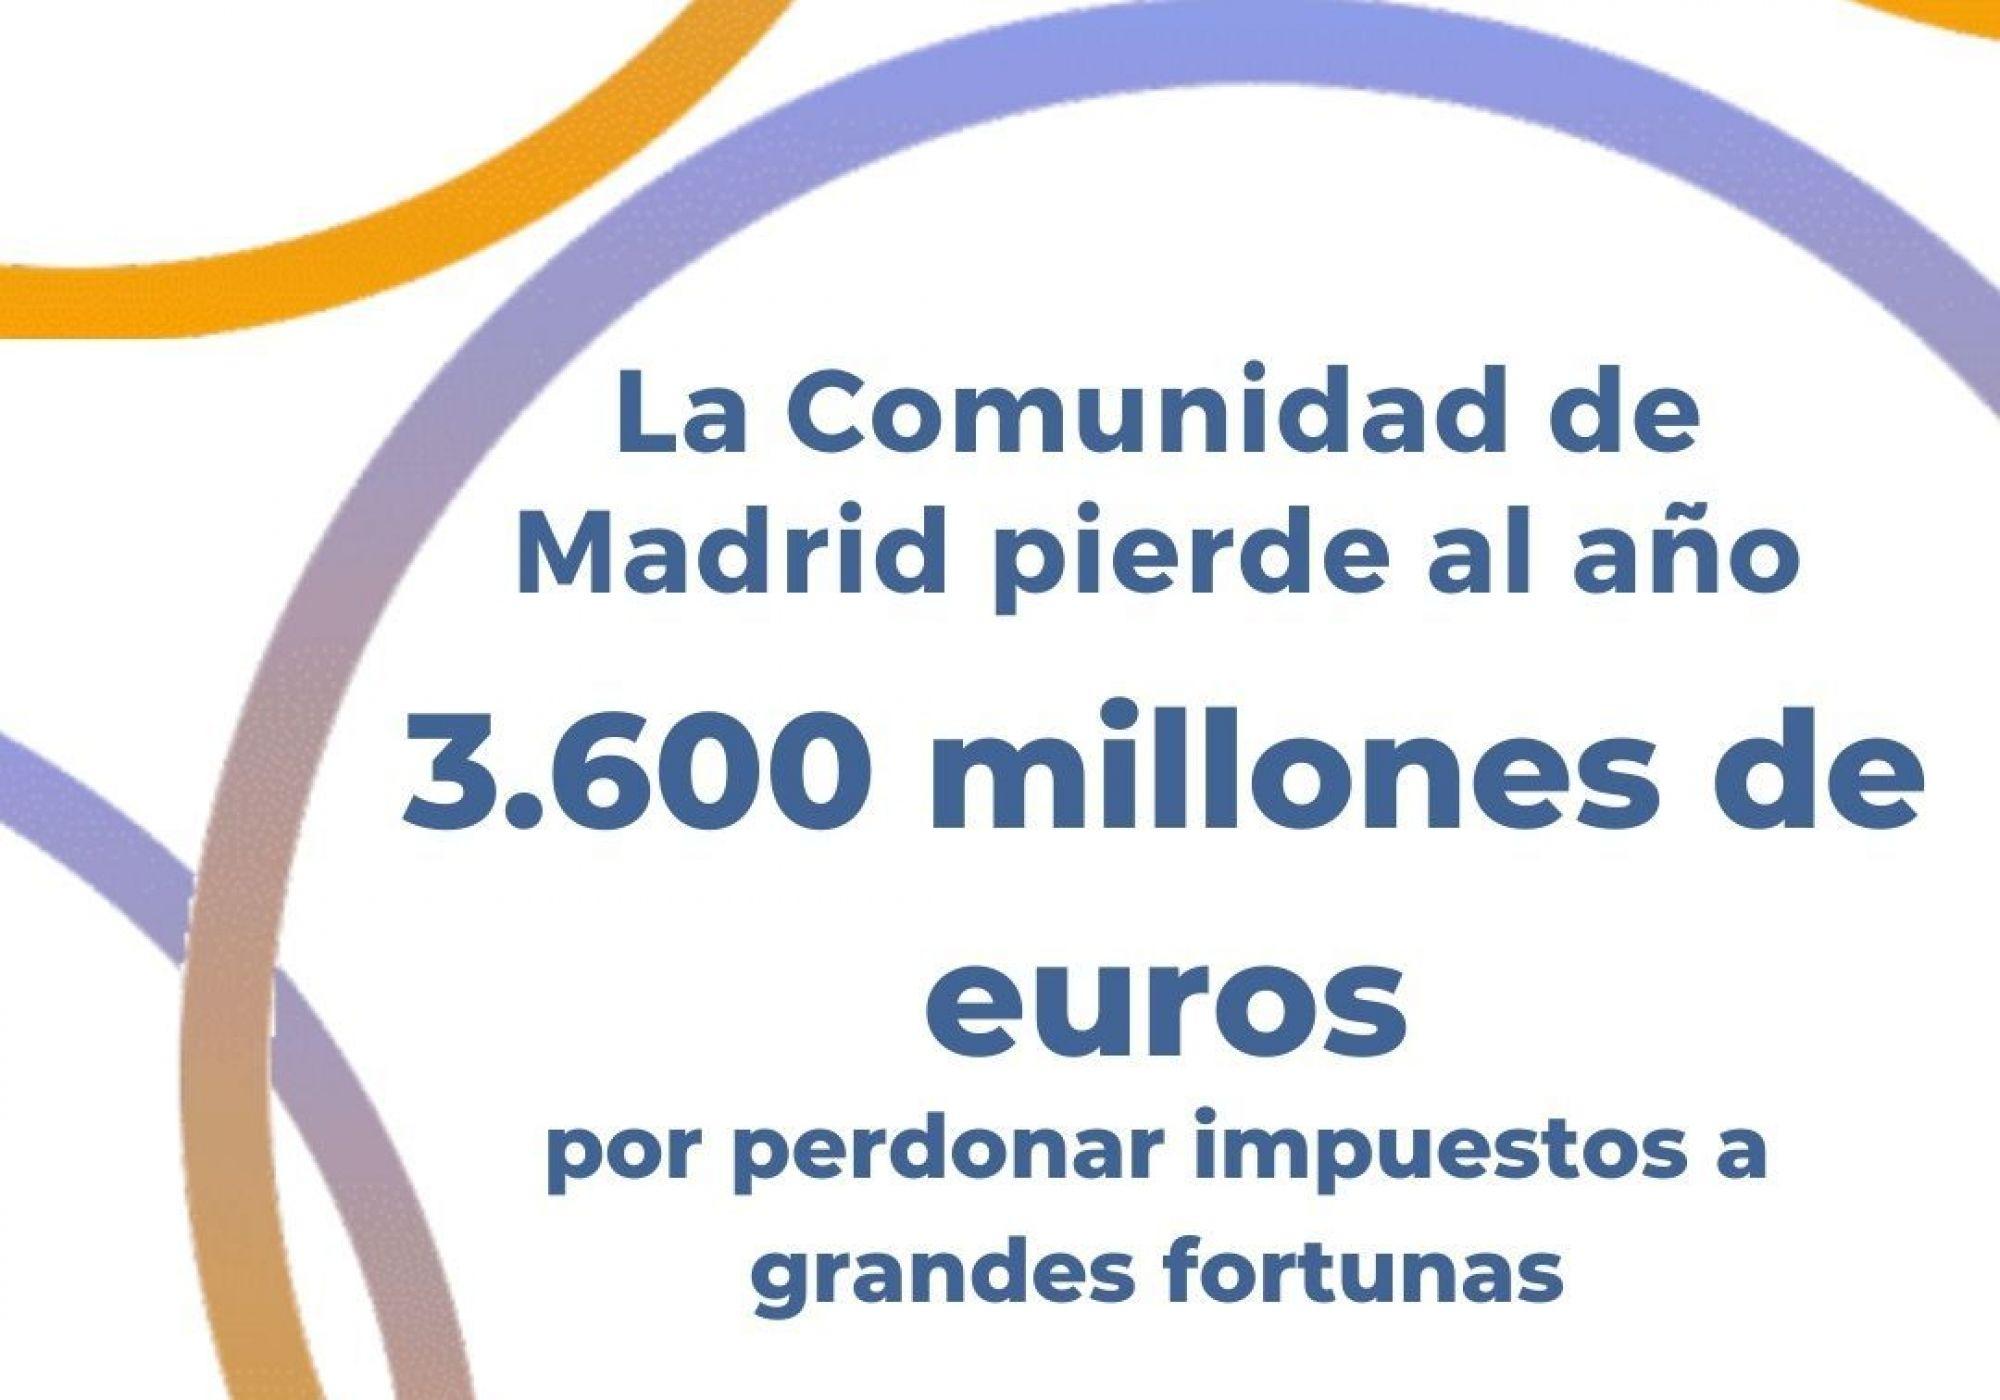 Bajar impuestos causa muertes: Madrid